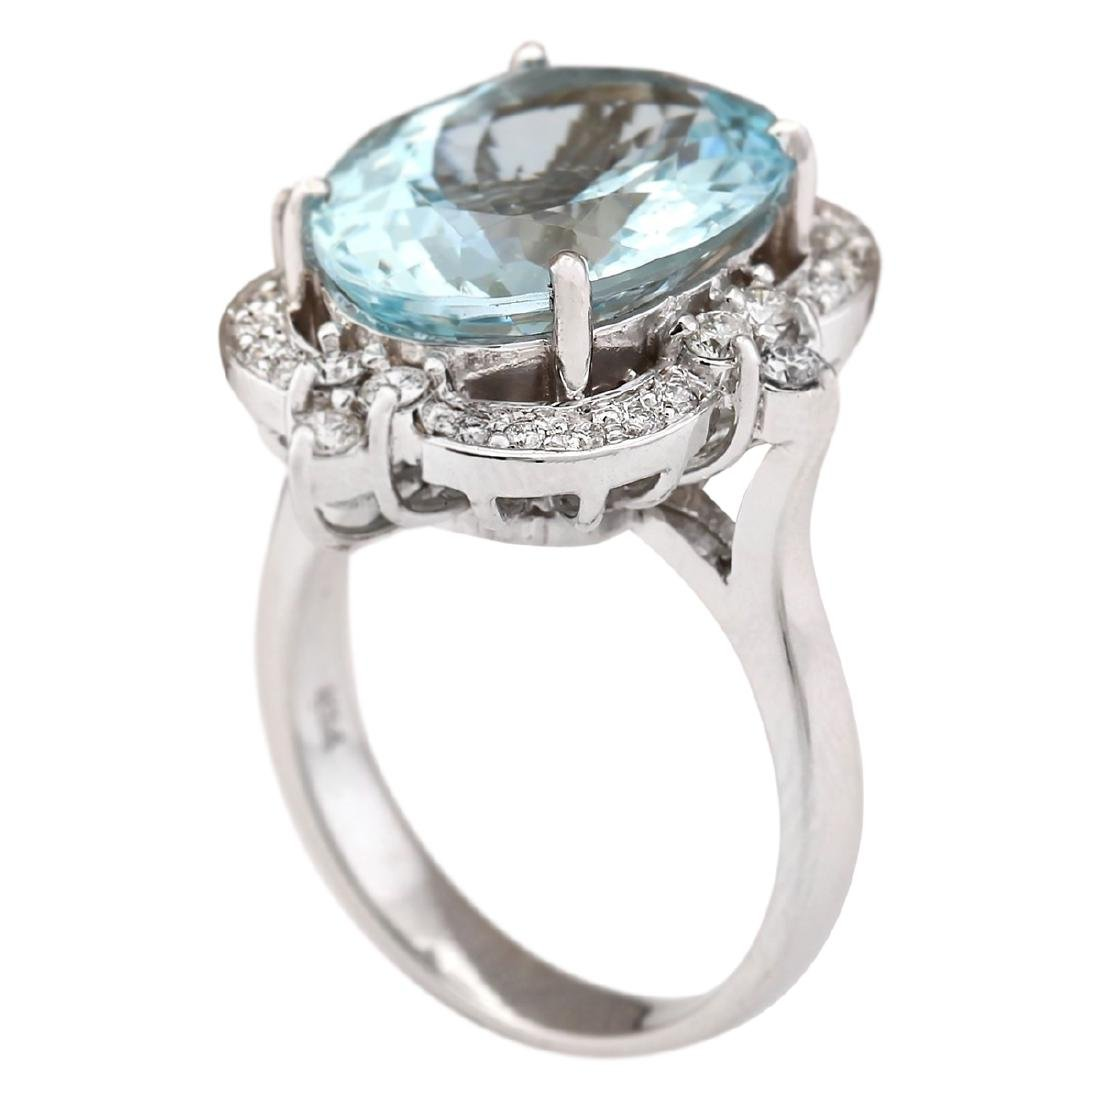 8.22 CTW Natural Aquamarine And Diamond Ring In 18K - 3